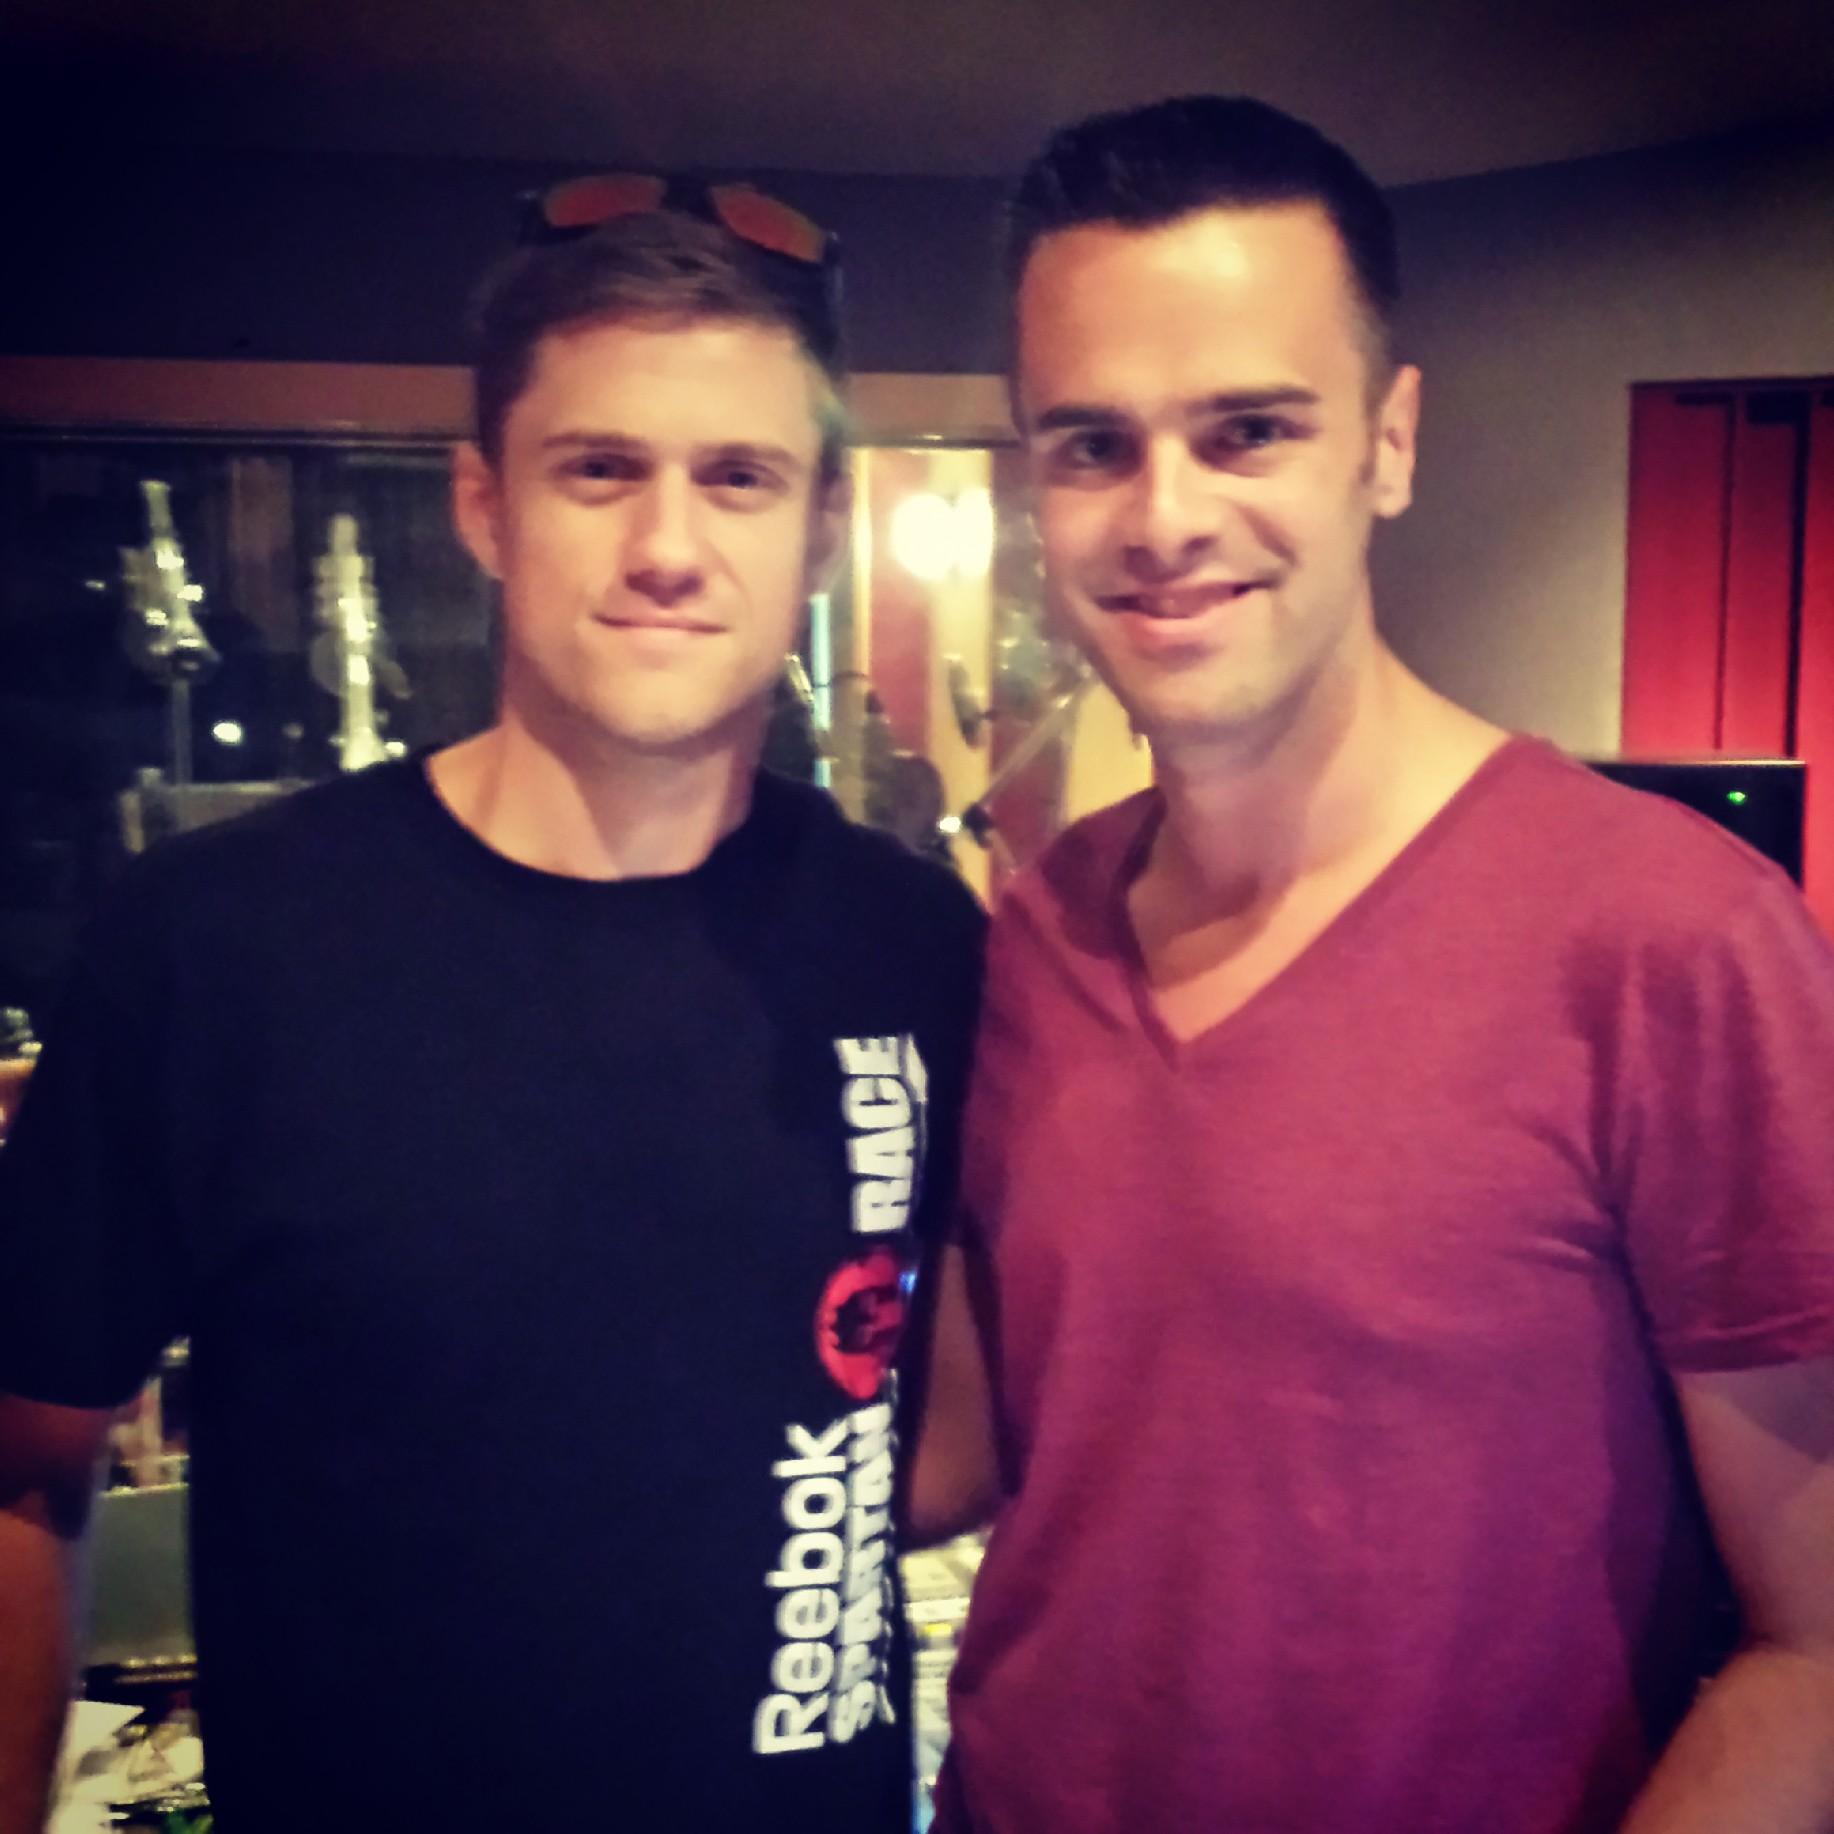 Michael J Moritz Jr and Aaron Tveit